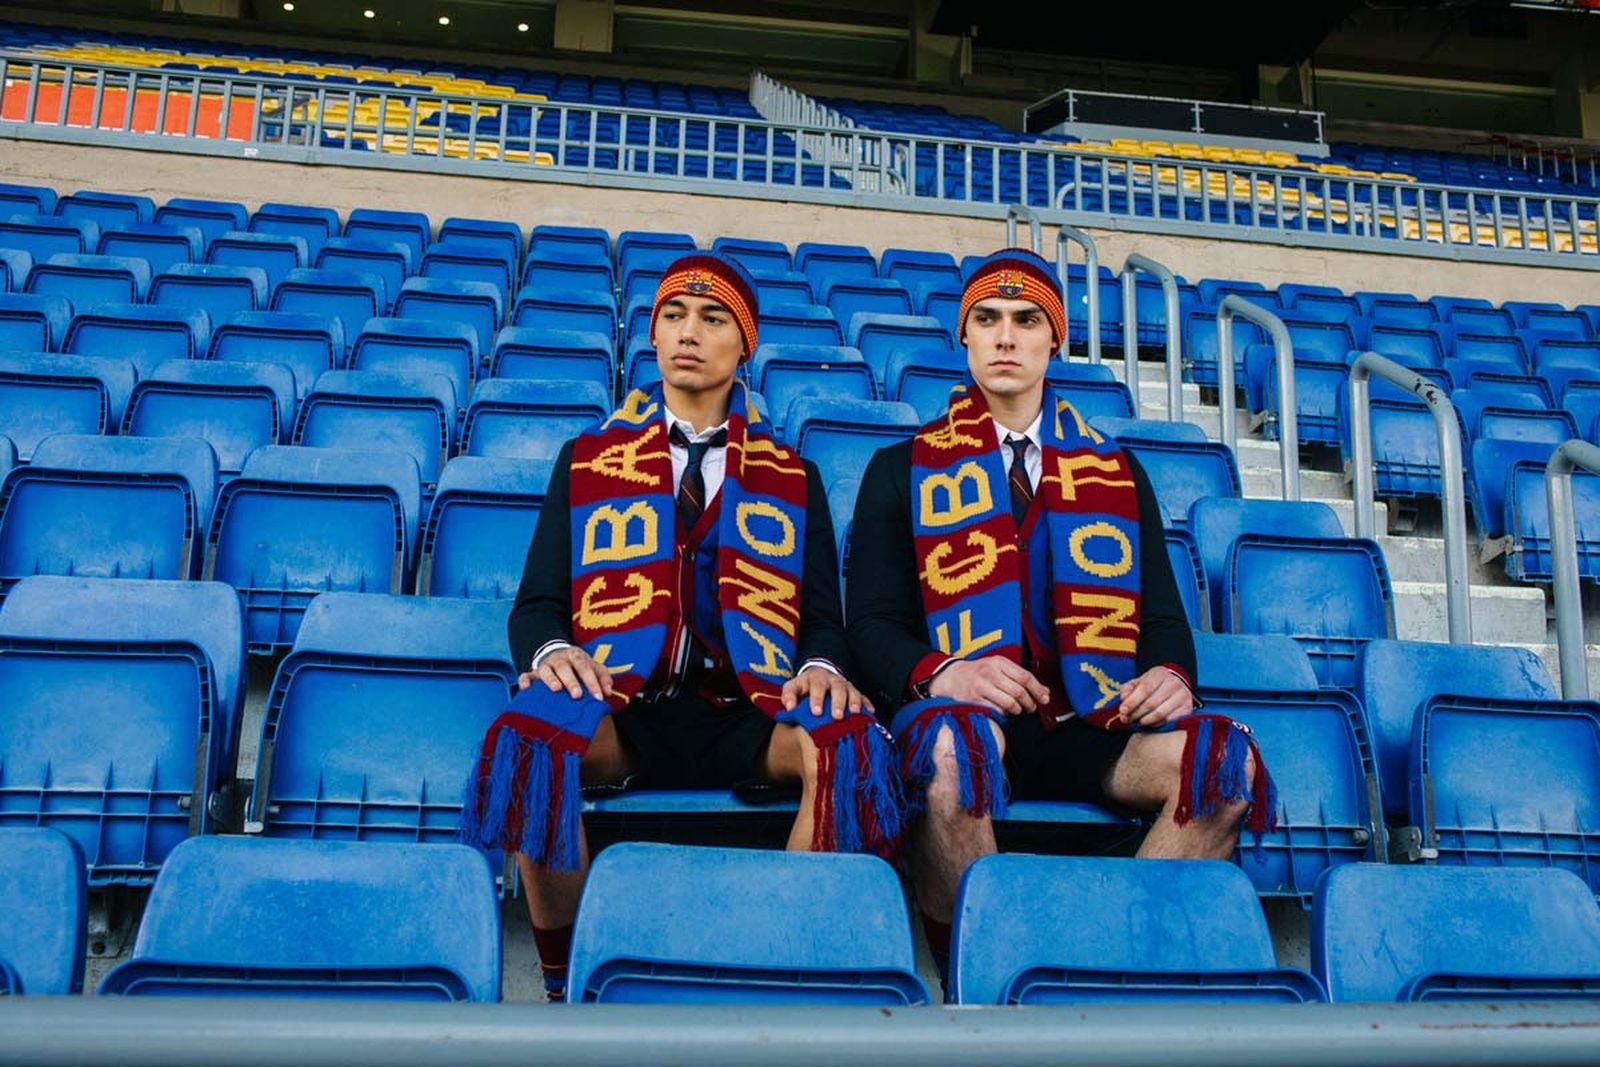 7thom-browne-barcalona-football-club